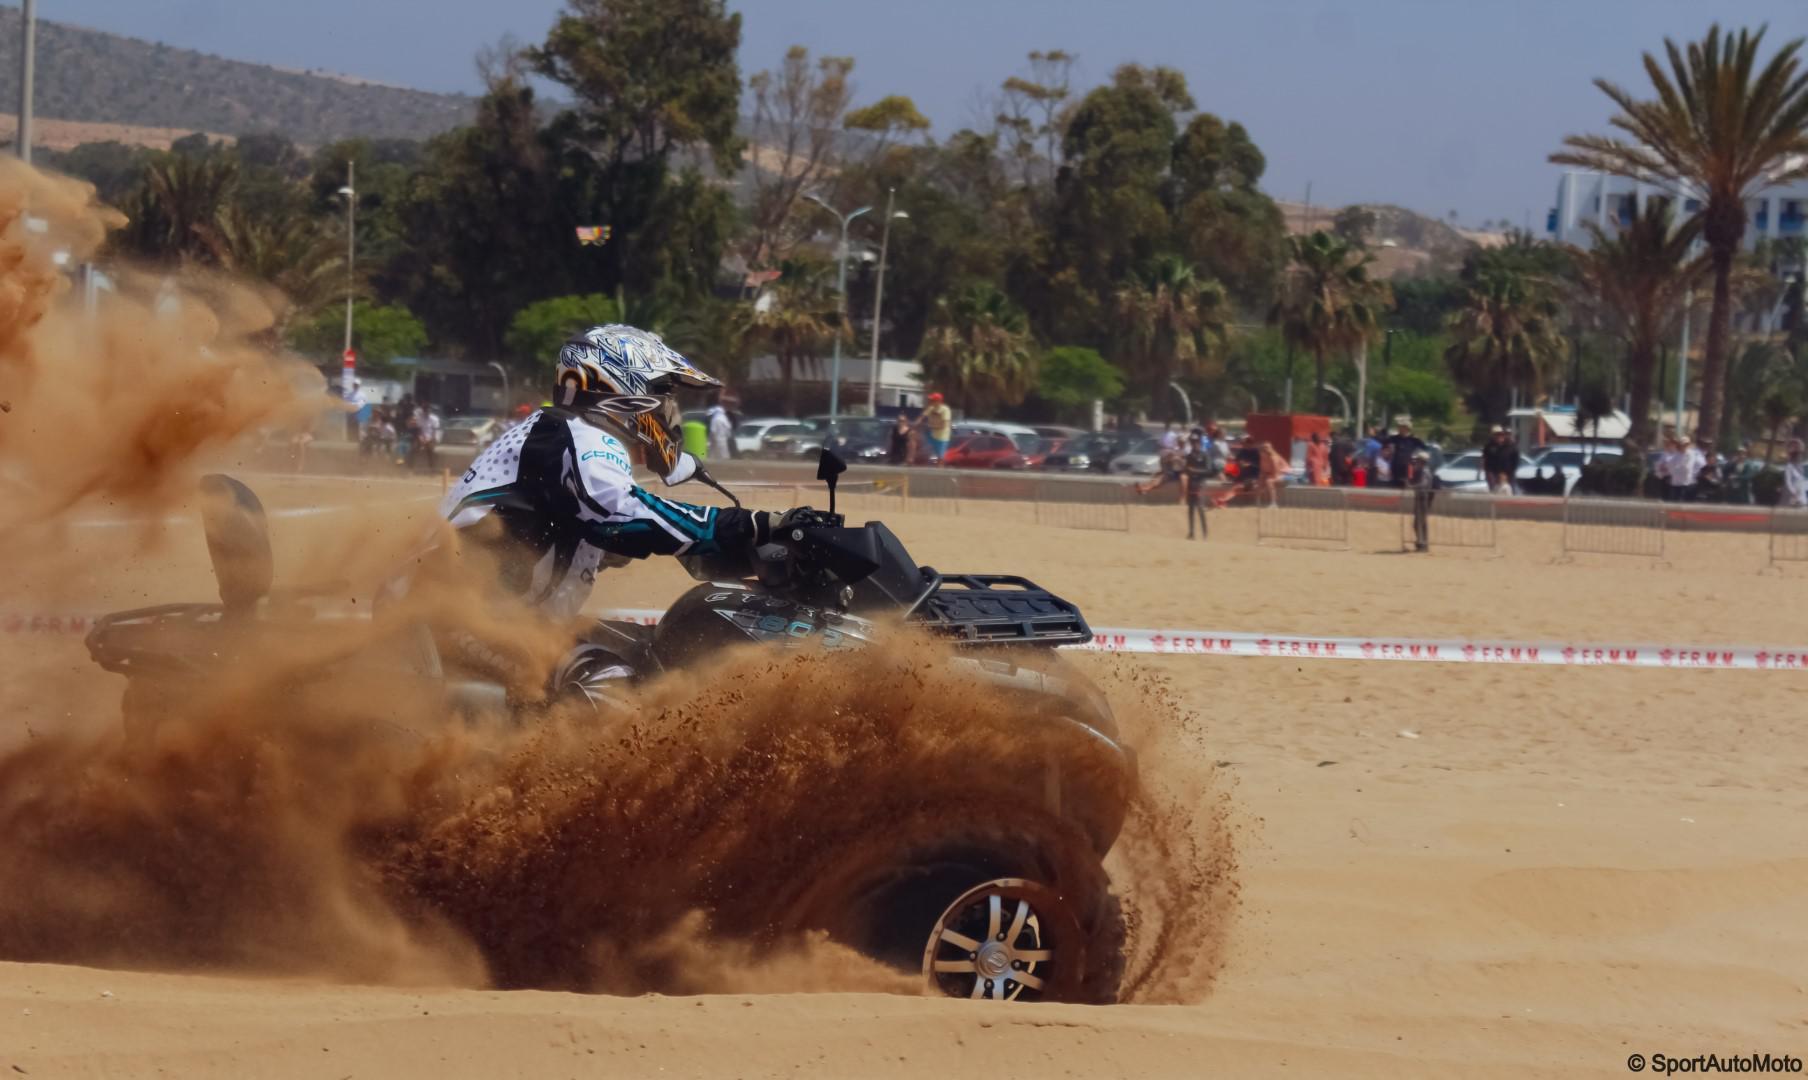 agadir-beach-race-la-reussite-791-24.jpg